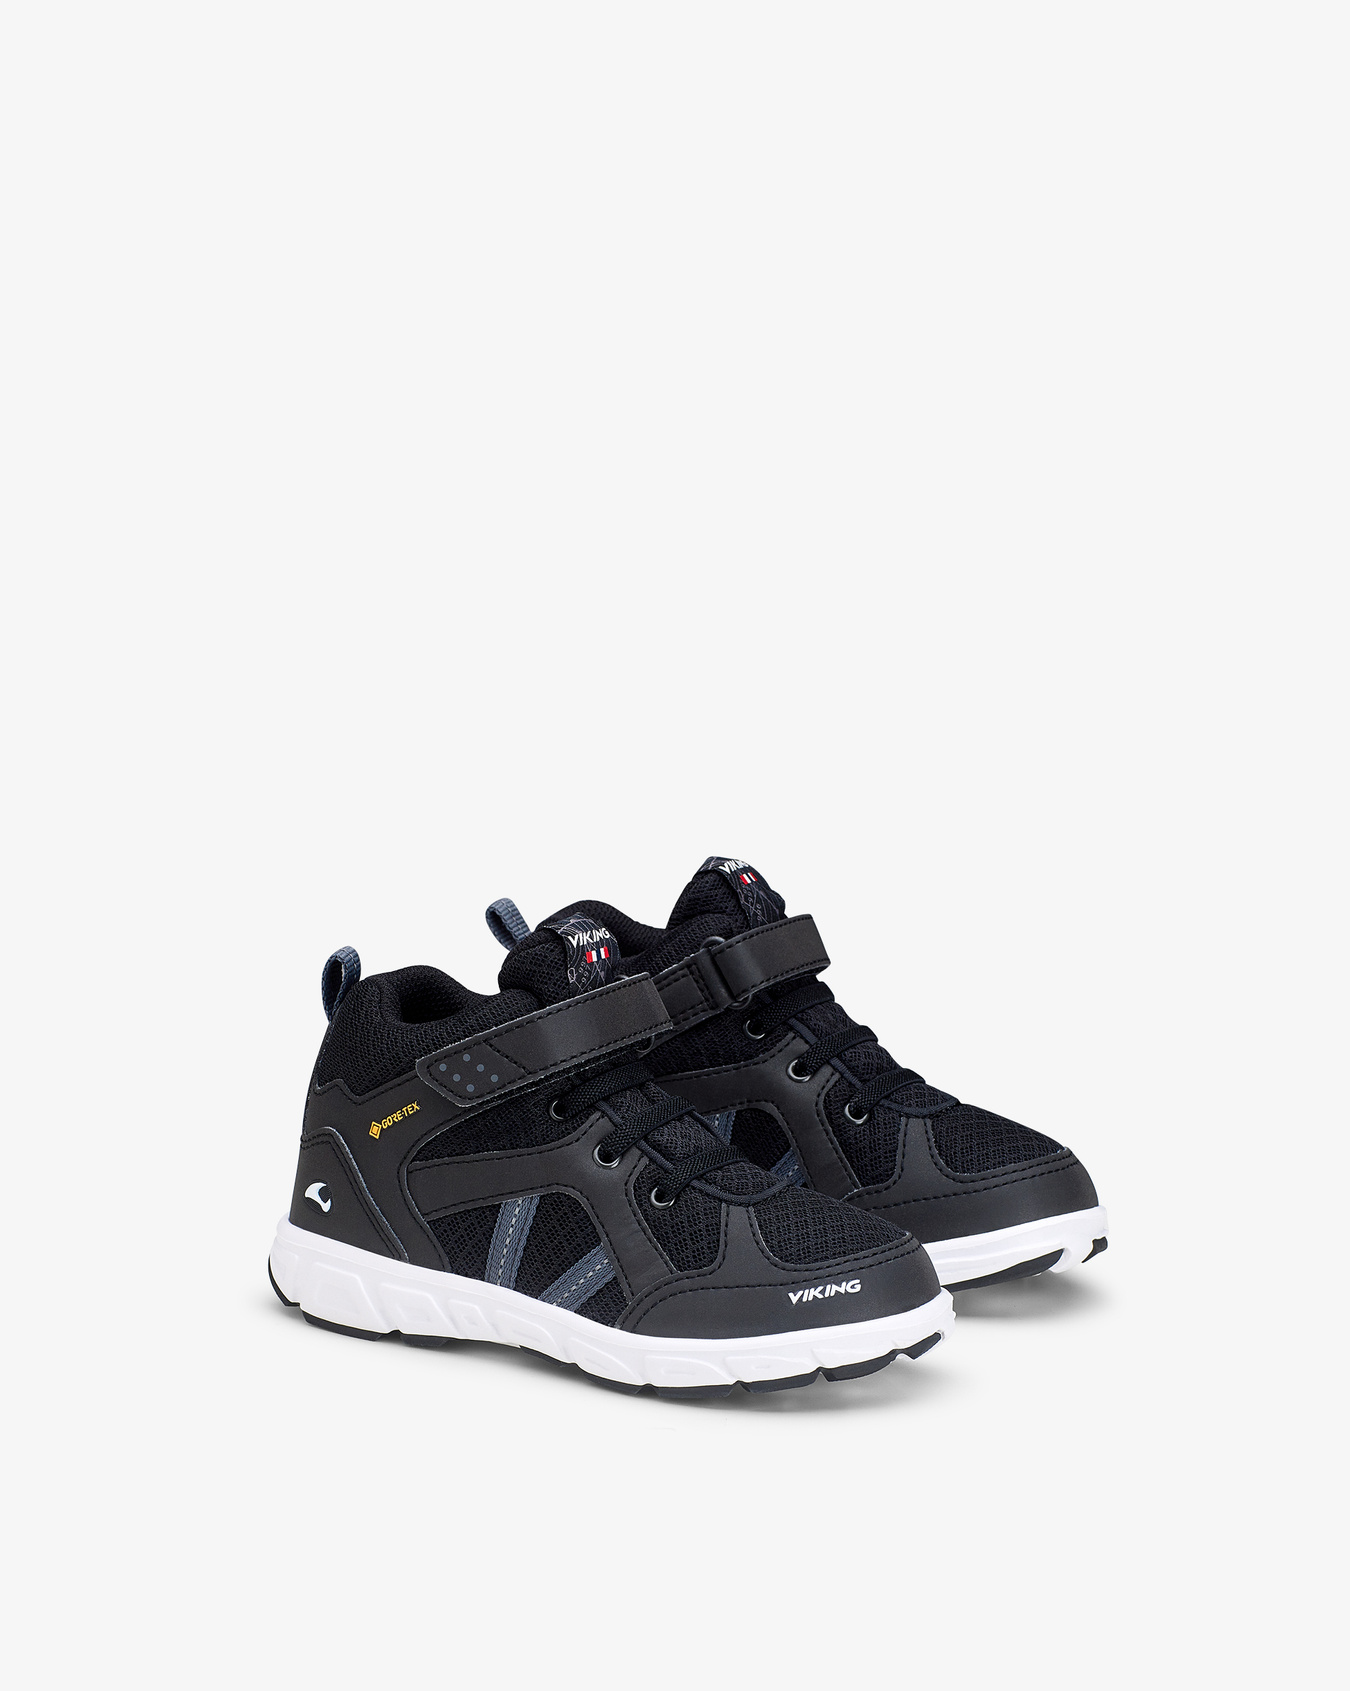 Alvdal Mid R GTX Black Charcoal Sneaker